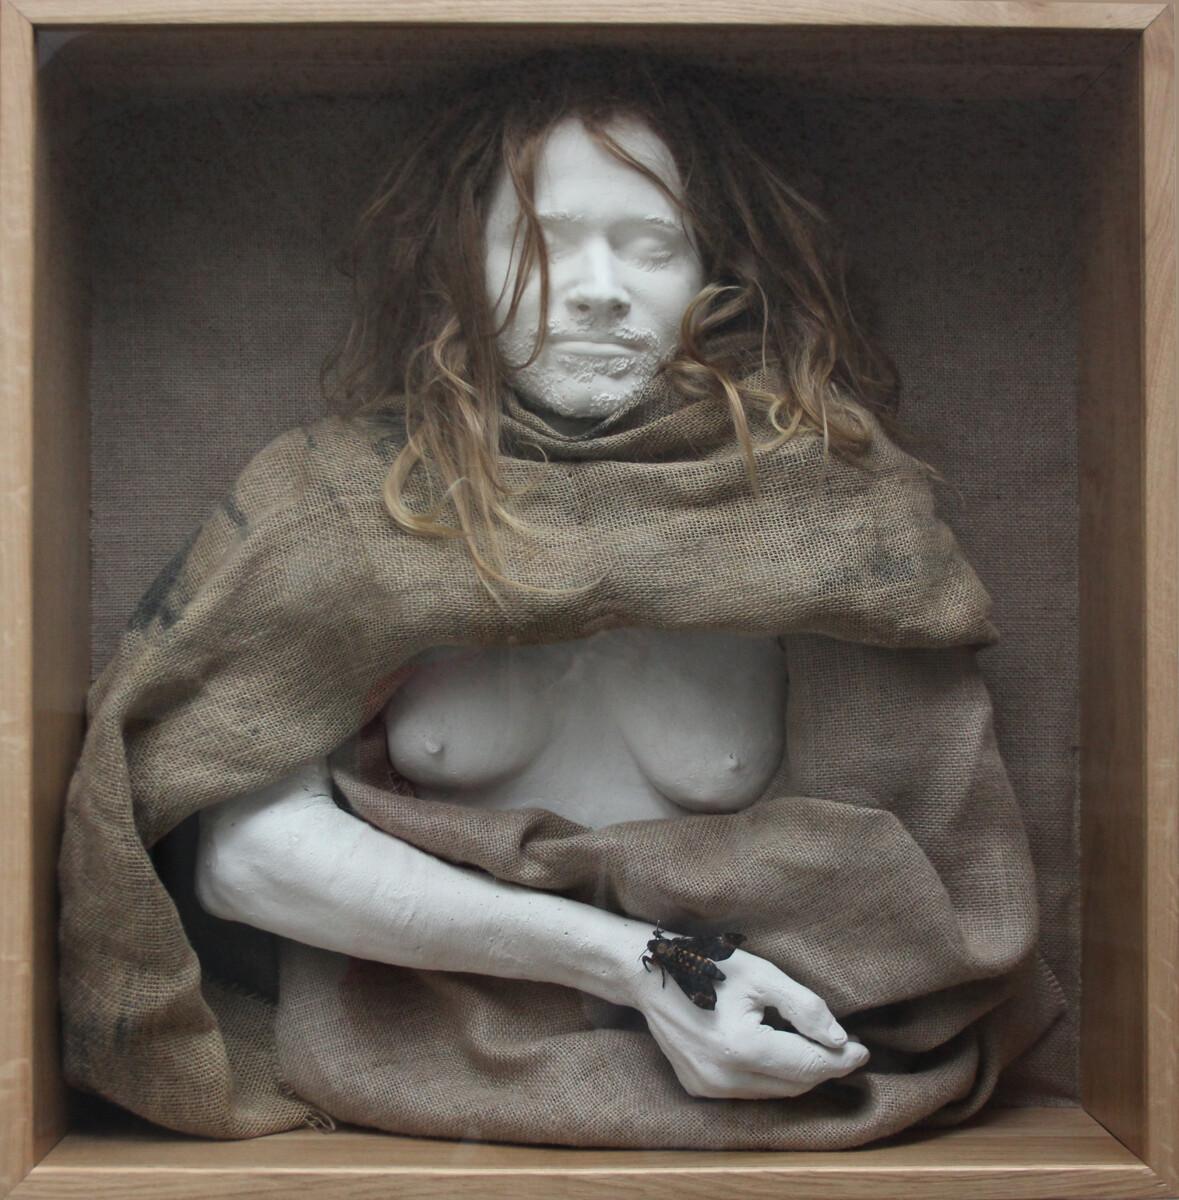 2021.1, mixed media: gypsum, jute, butterfly, oak, human hair, 70*70 cm - Dirk Mutsaerts